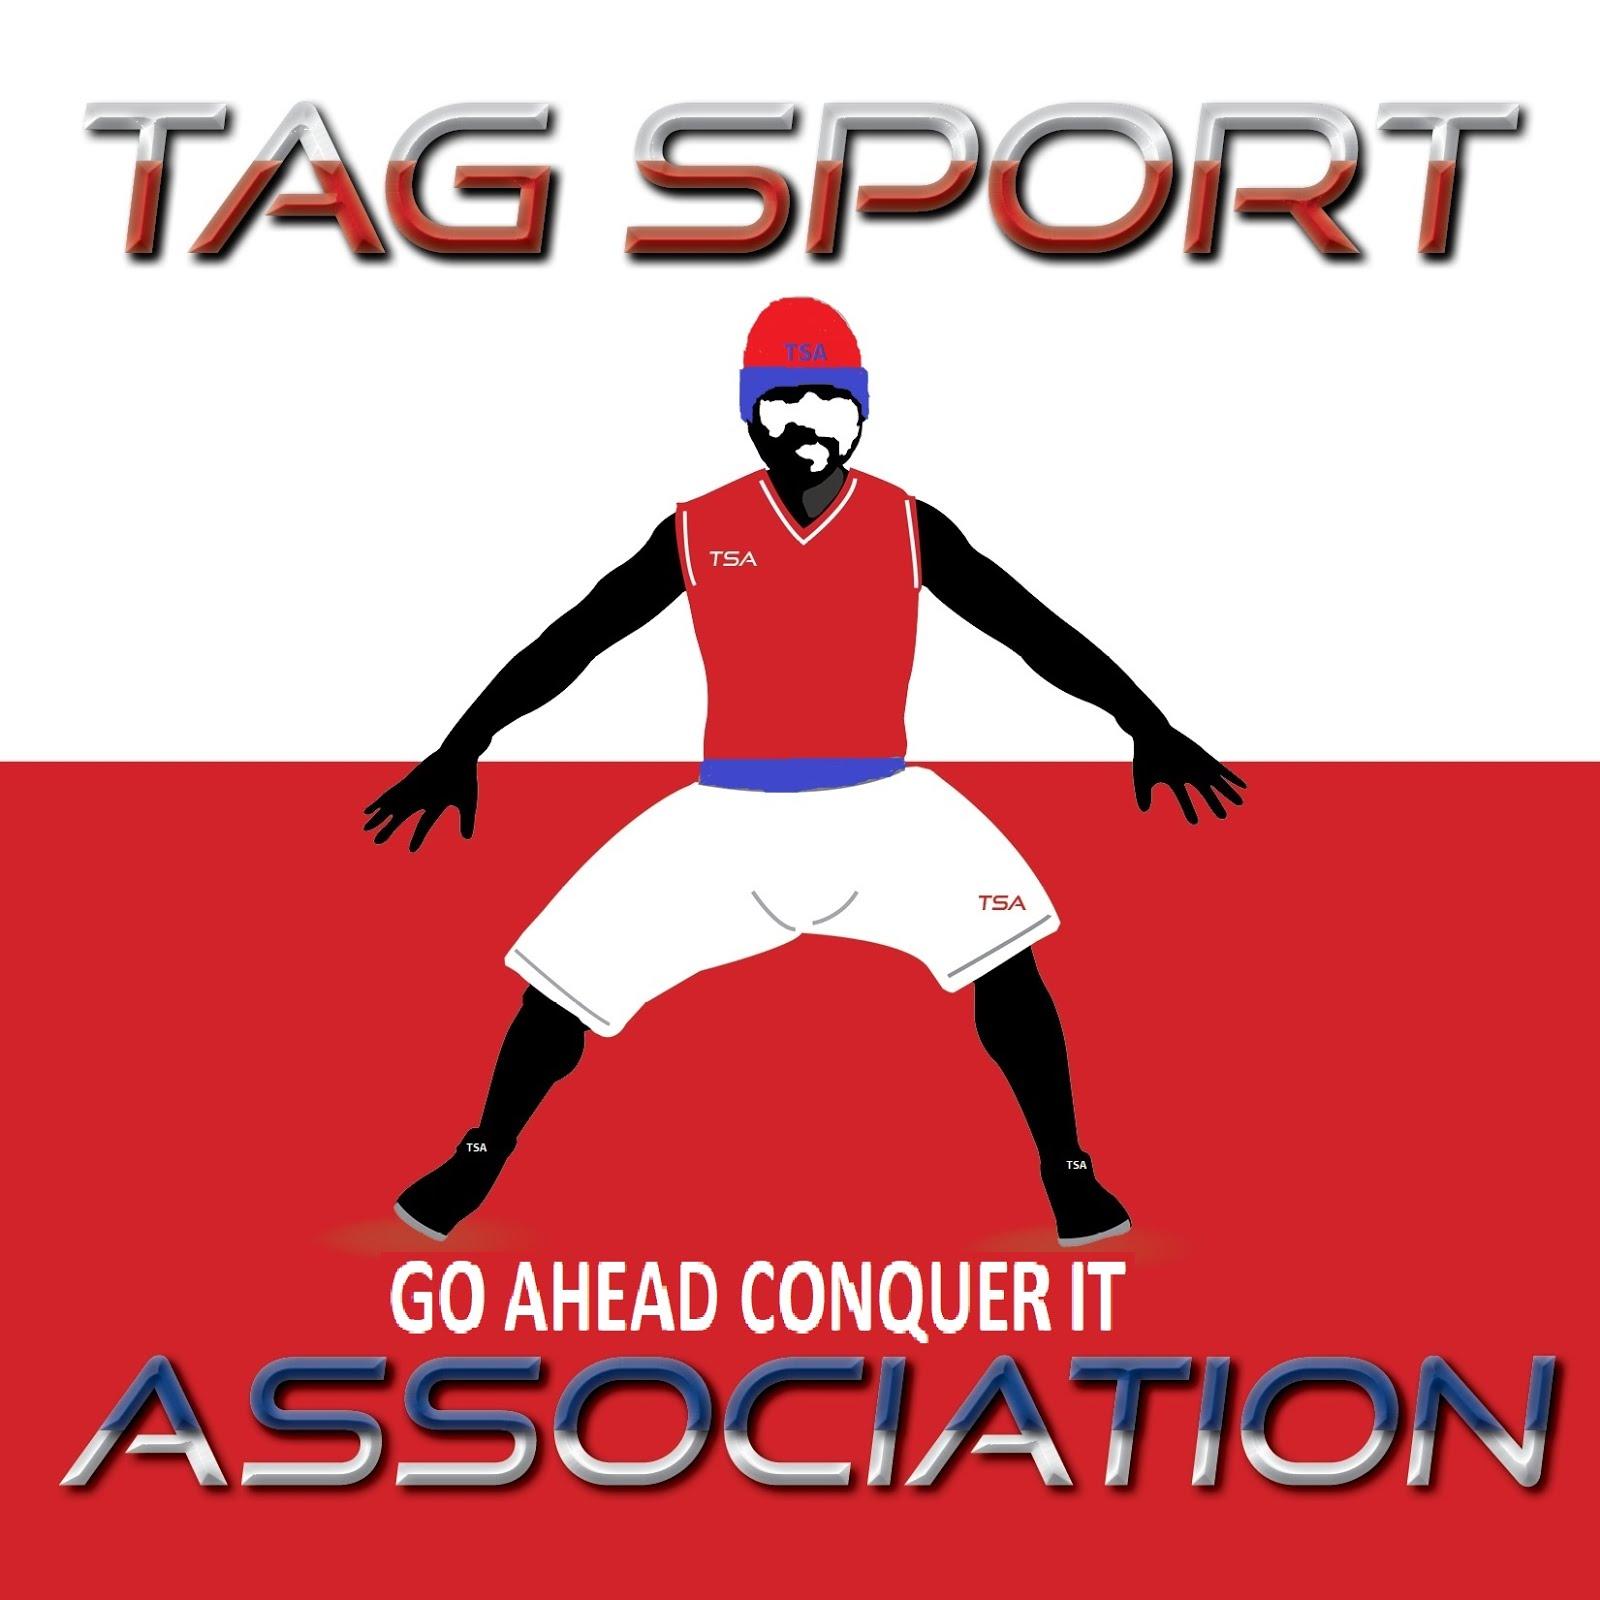 TAG SPORT ASSOCIATION